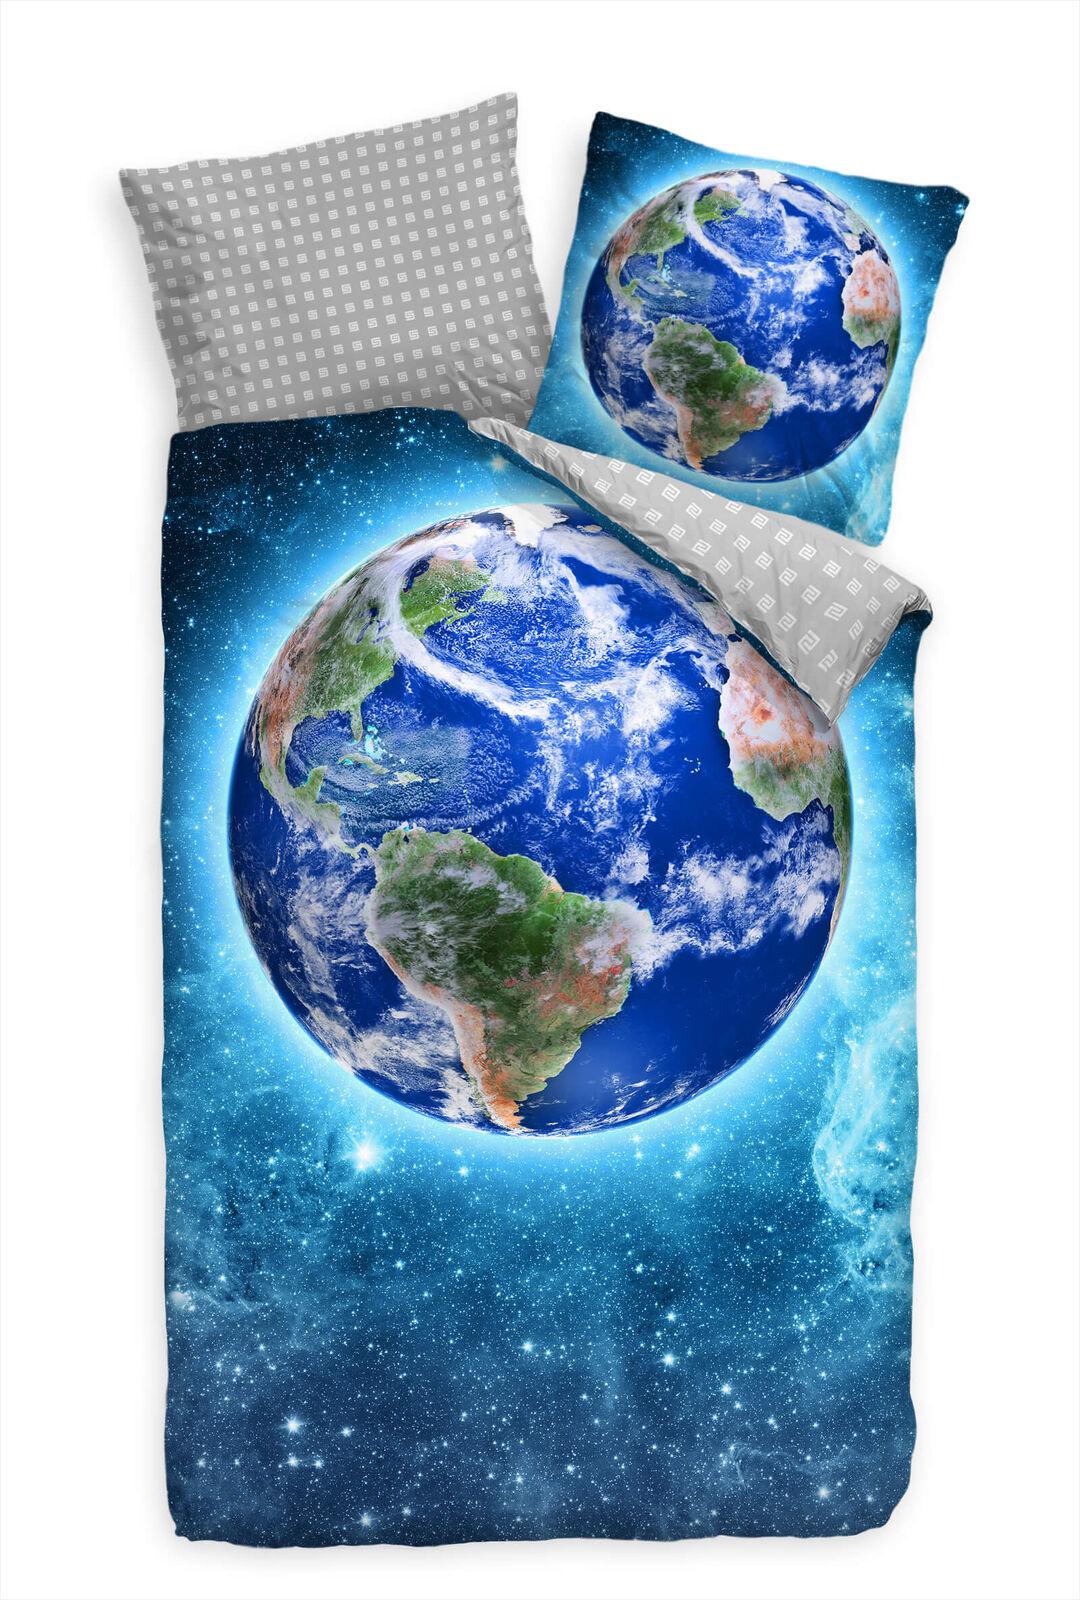 Erdkugel Blau Weltall Sterne Bettwäsche Set 135x200 cm + 80x80cm  Atmungsaktiv